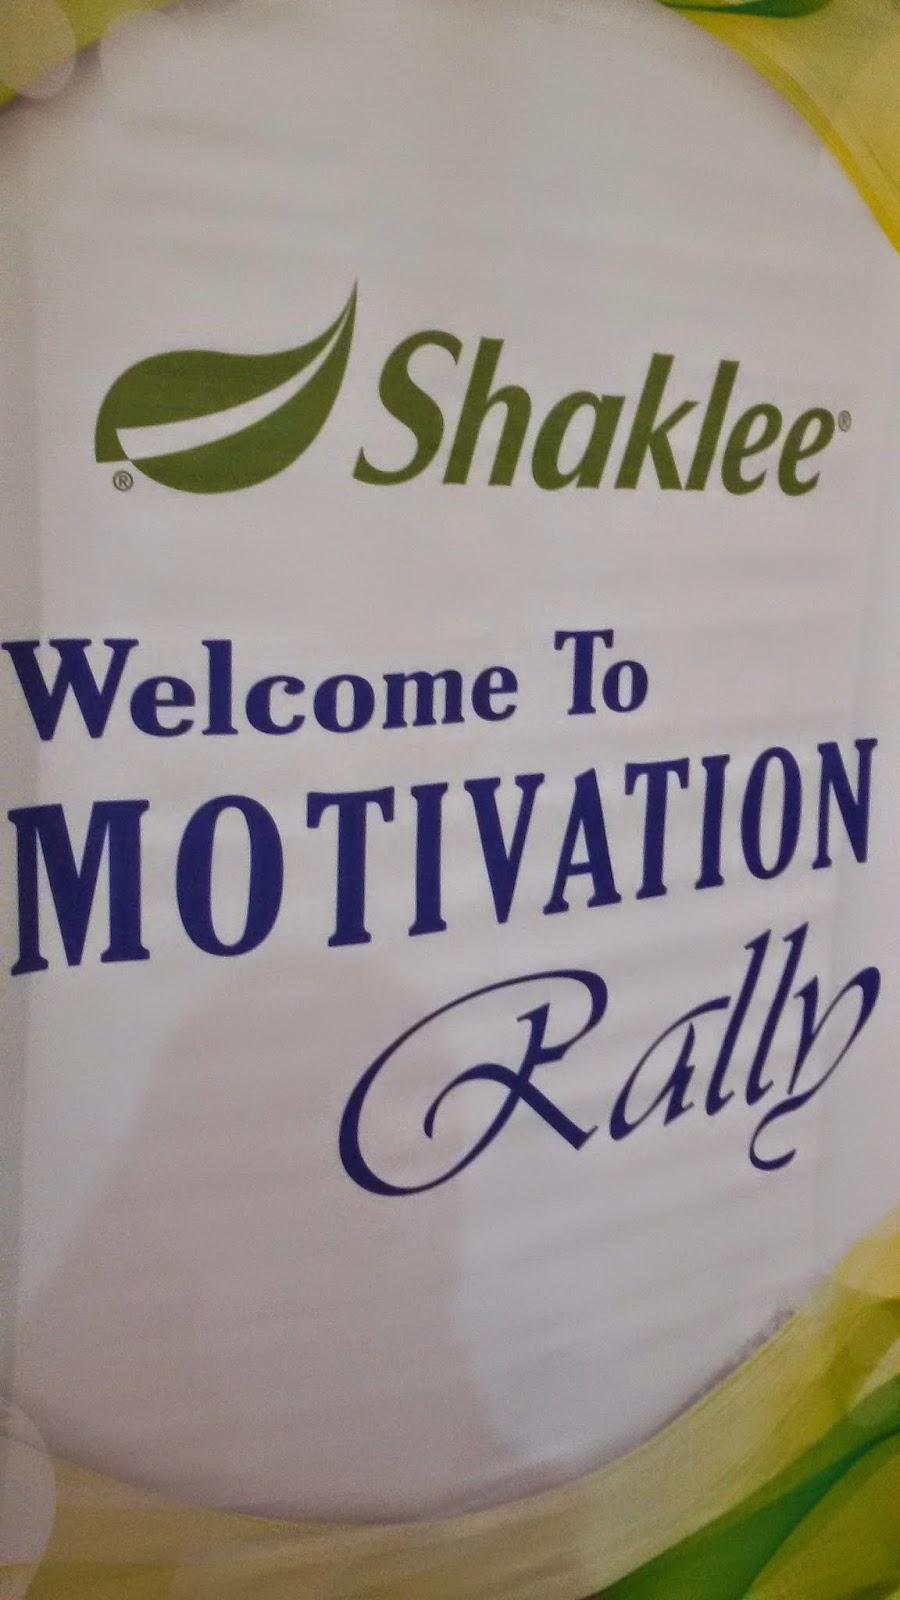 Naik pentas sempena Shaklee Motivation Rally di Shah Alam Convention Centre SACC